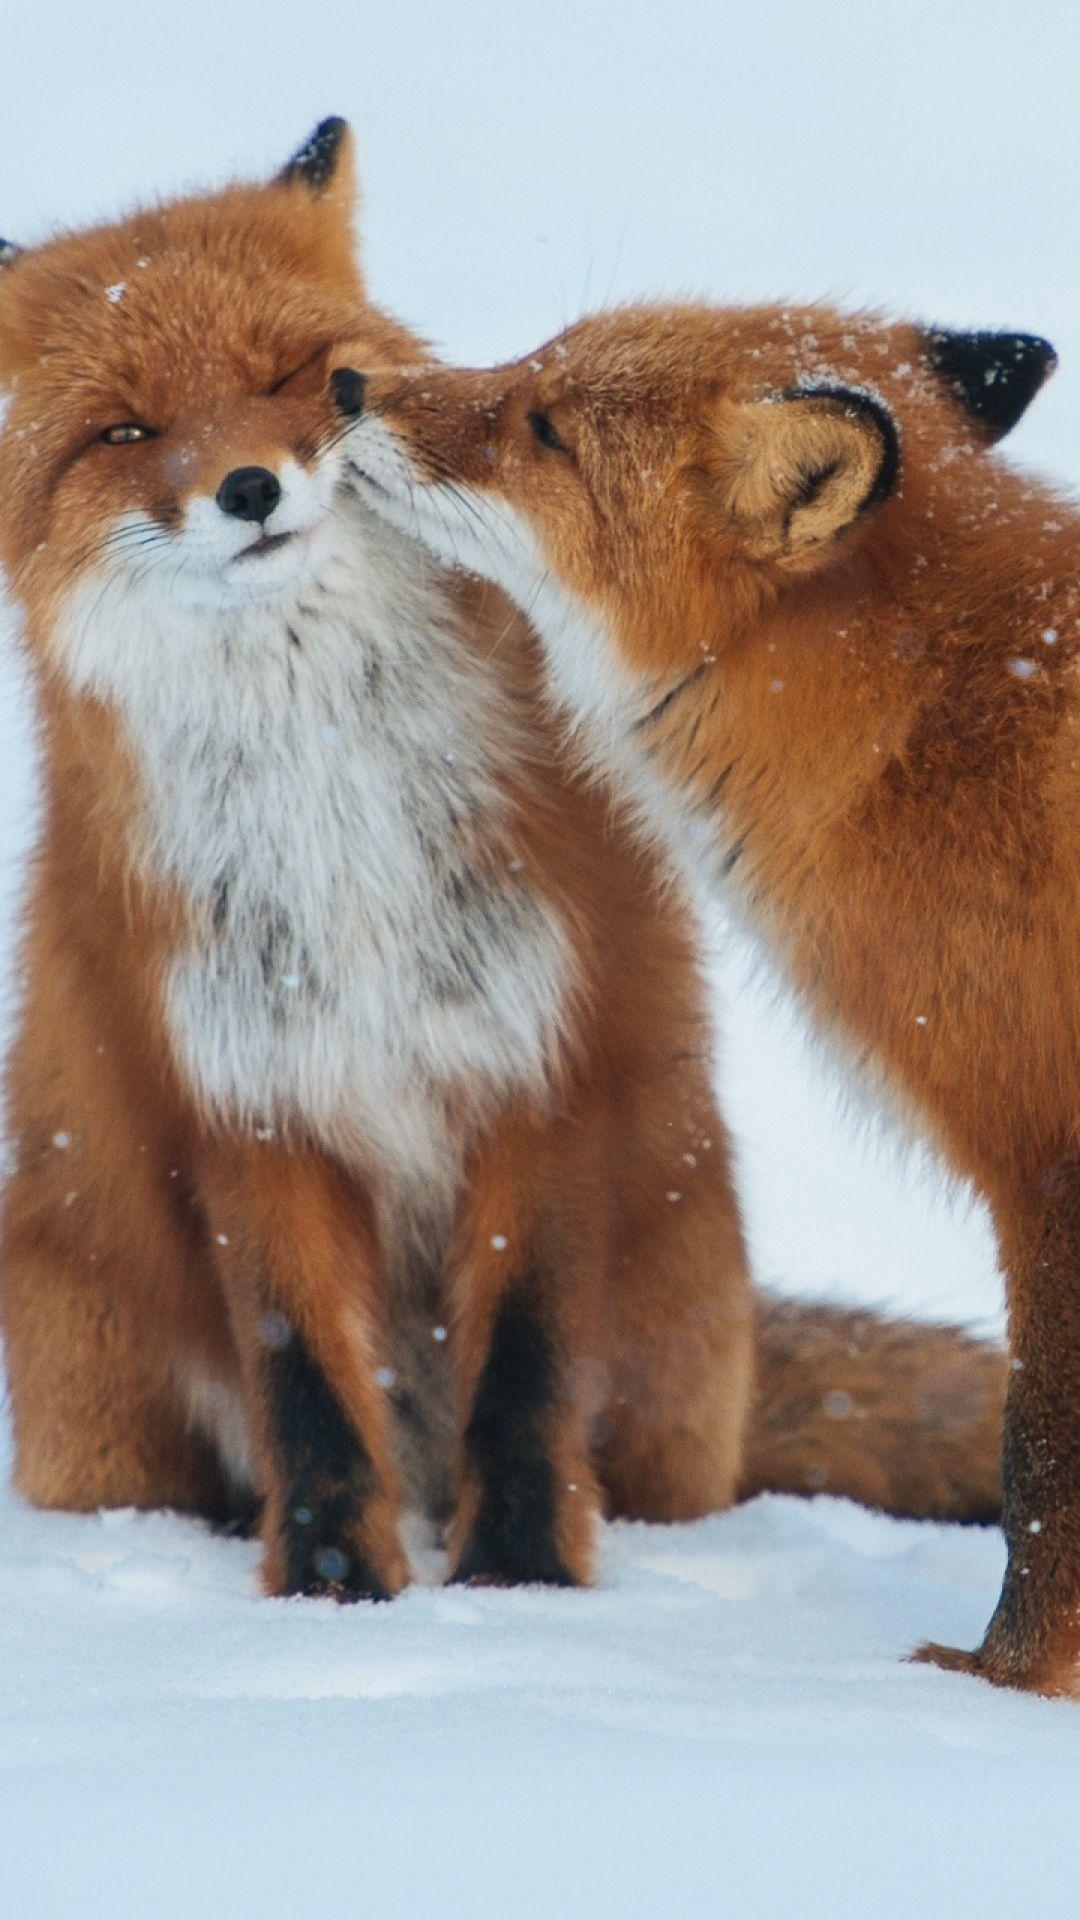 1080x1920 Wallpaper Fox Couple Snow Winter Care Zorros Animals Cute